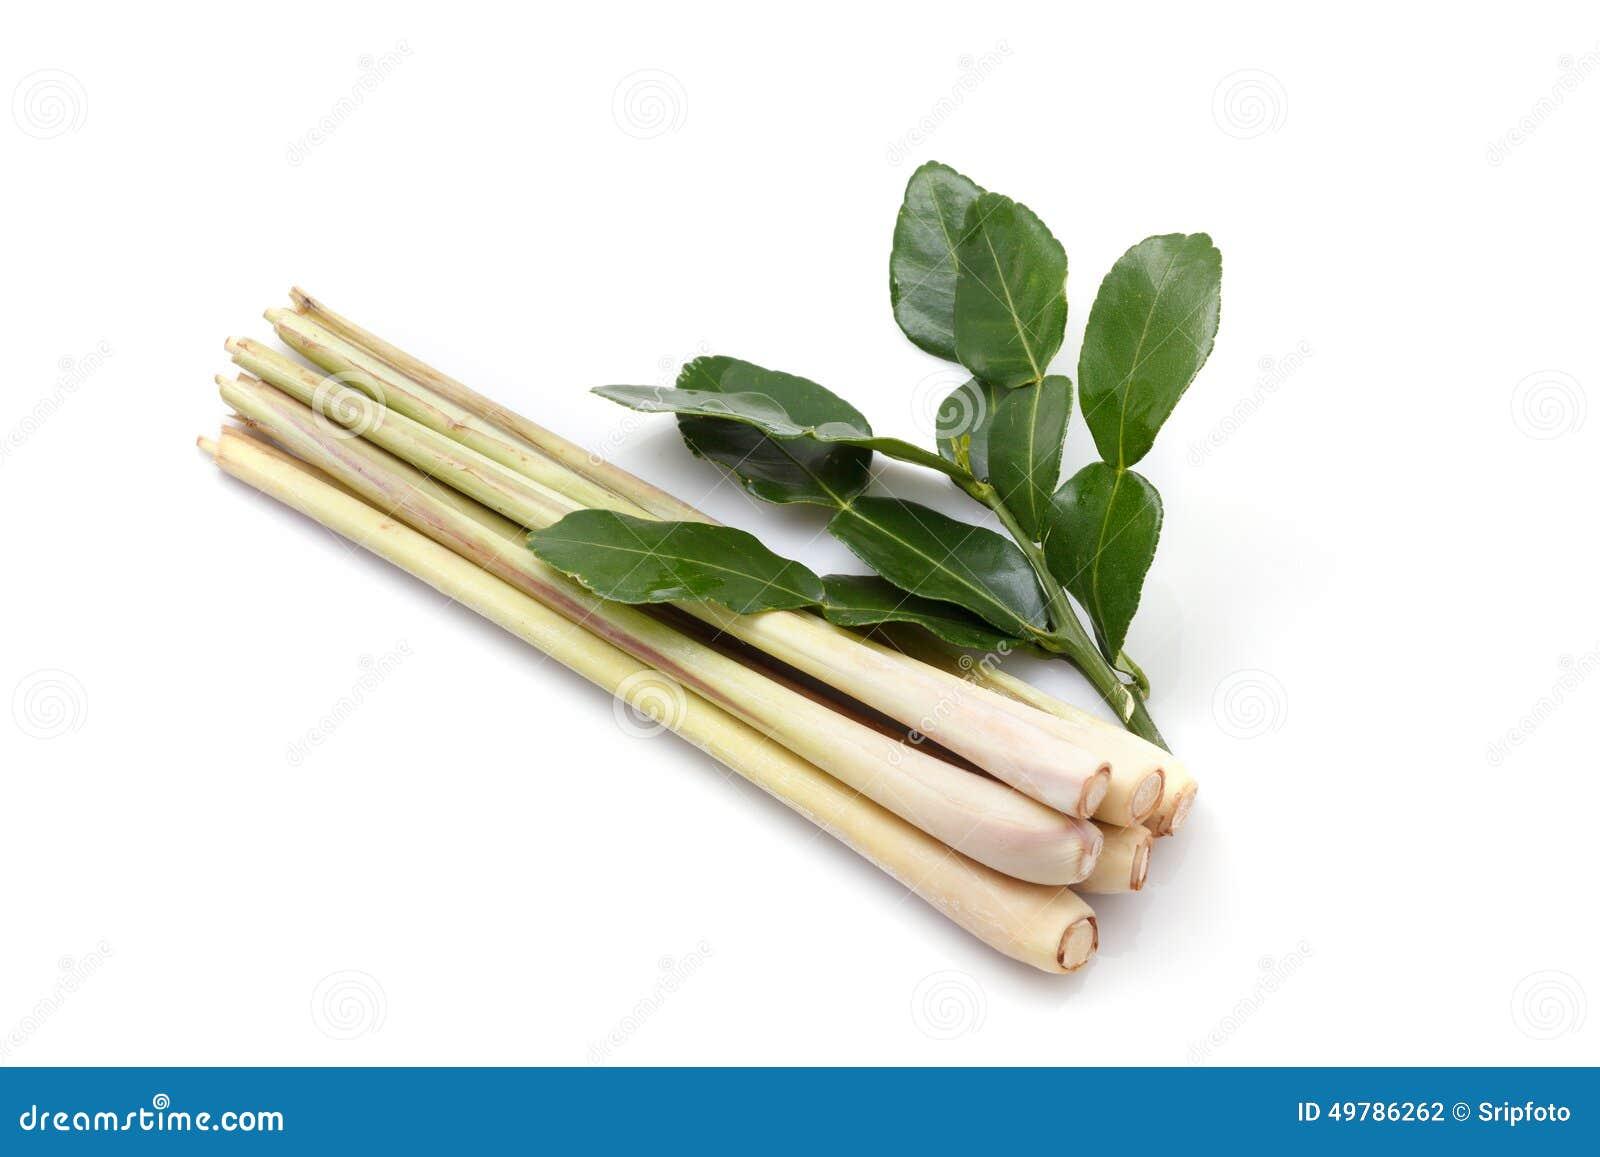 ... two whole kaffir limes kaffir lime leaves sliced lime lemon grass and